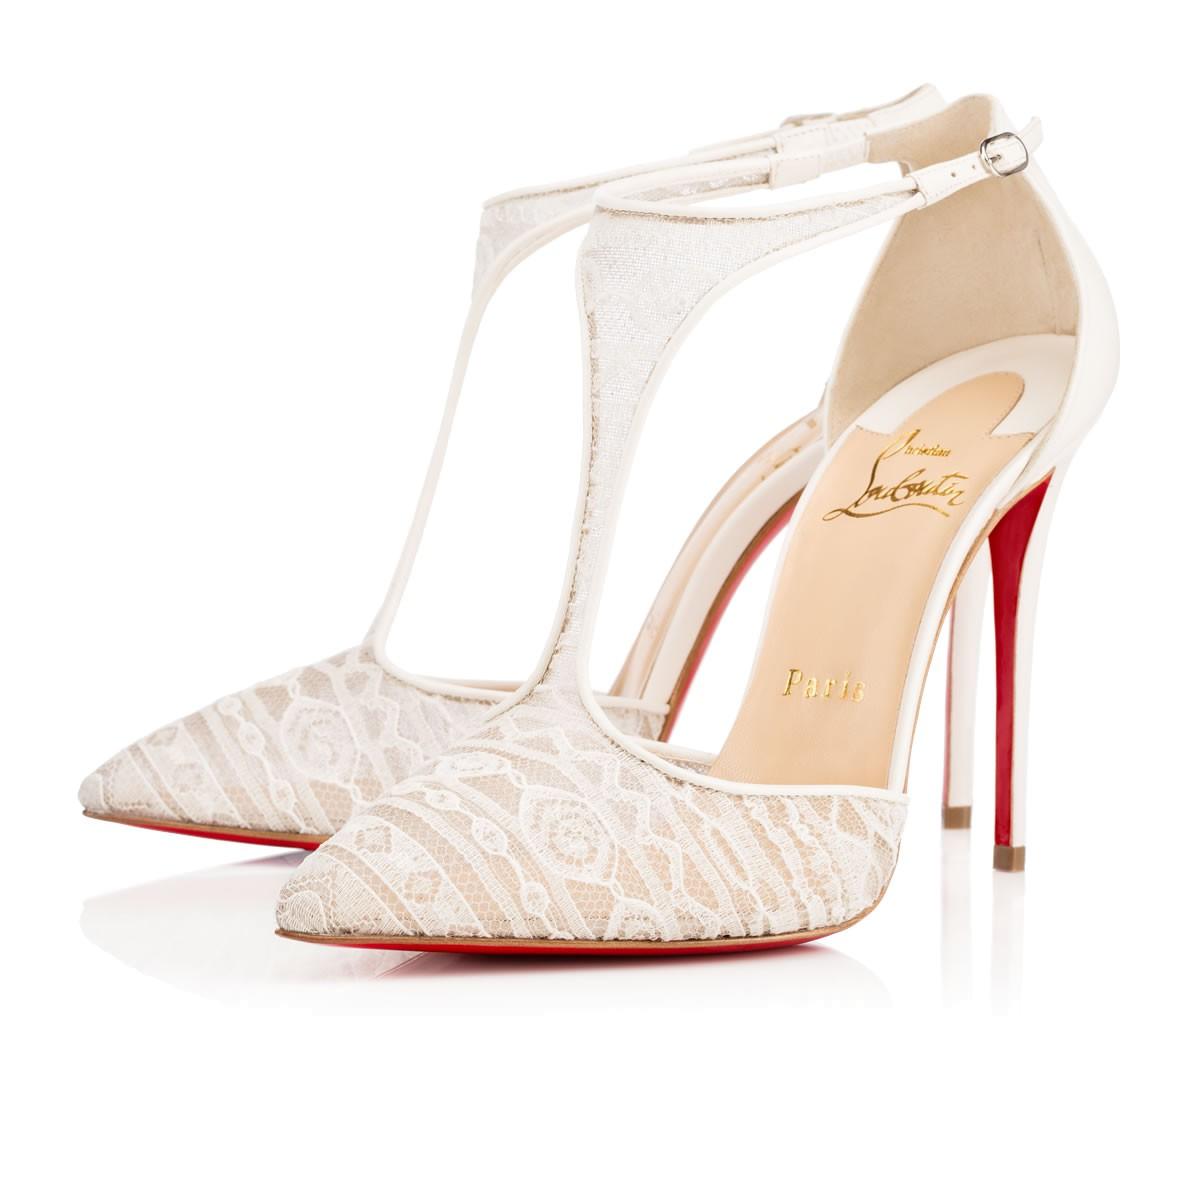 Super Stylish Wedding Shoes For A Fashionista Bride Helen Eriksen